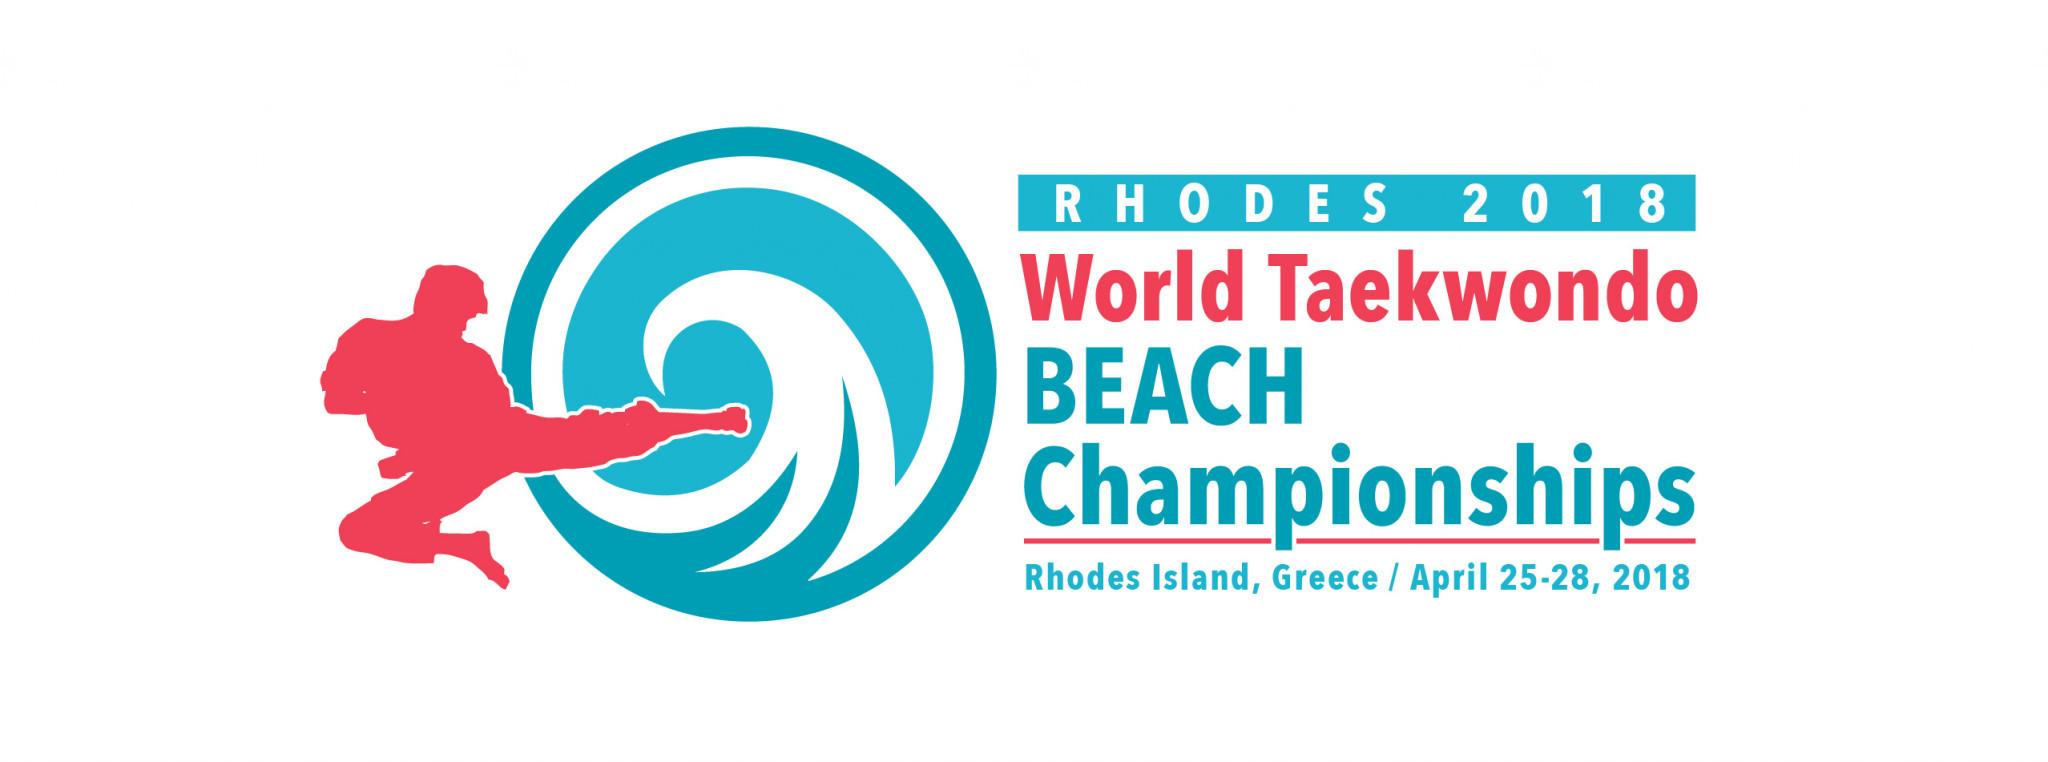 Organisers of the World Taekwondo Beach Championships have unveiled the logo and venue ©World Taekwondo